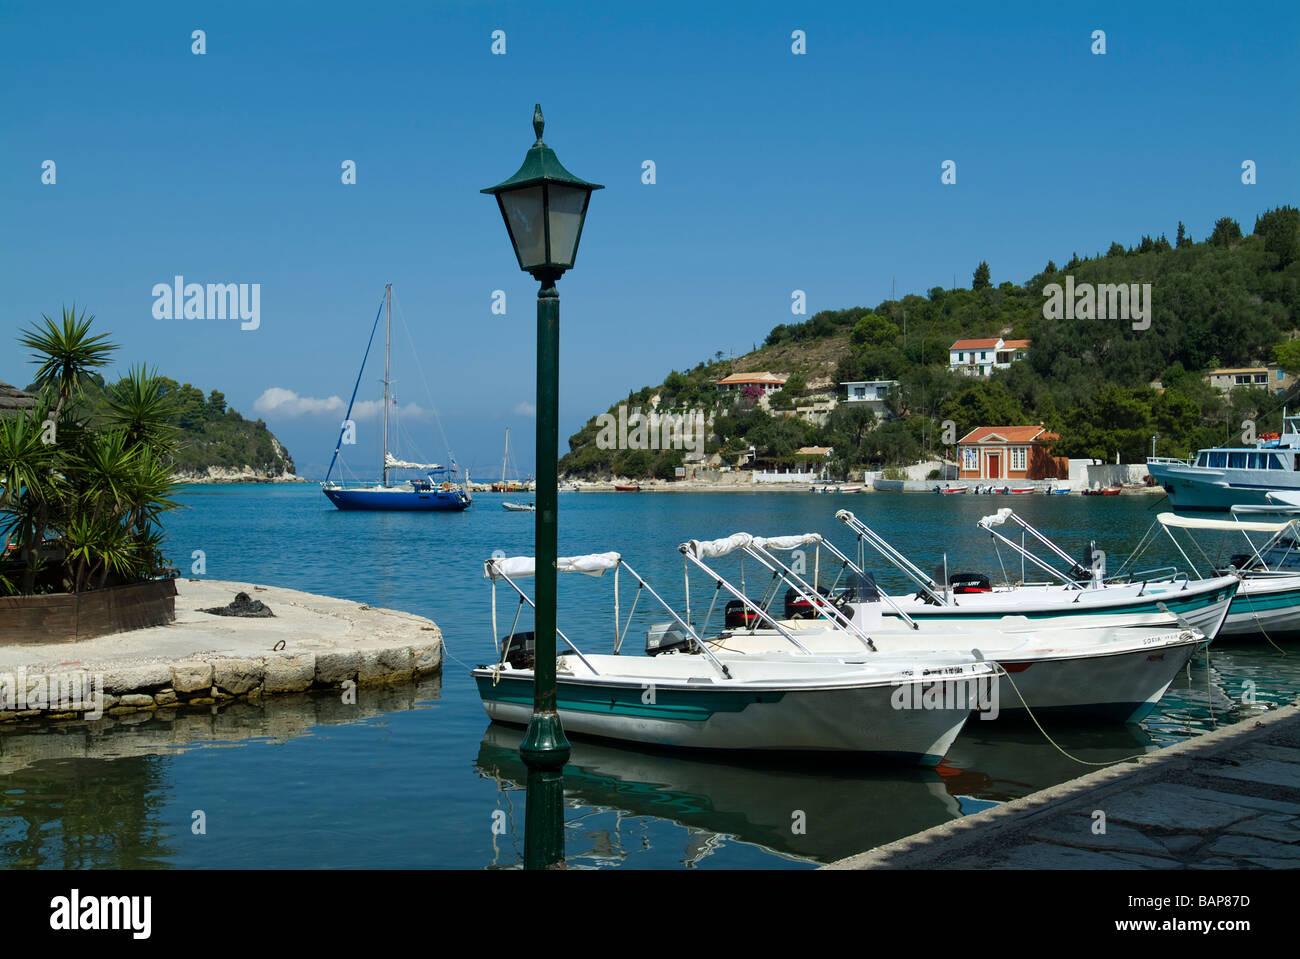 Lakka, Paxos, Ionian Islands, Greece - Stock Image